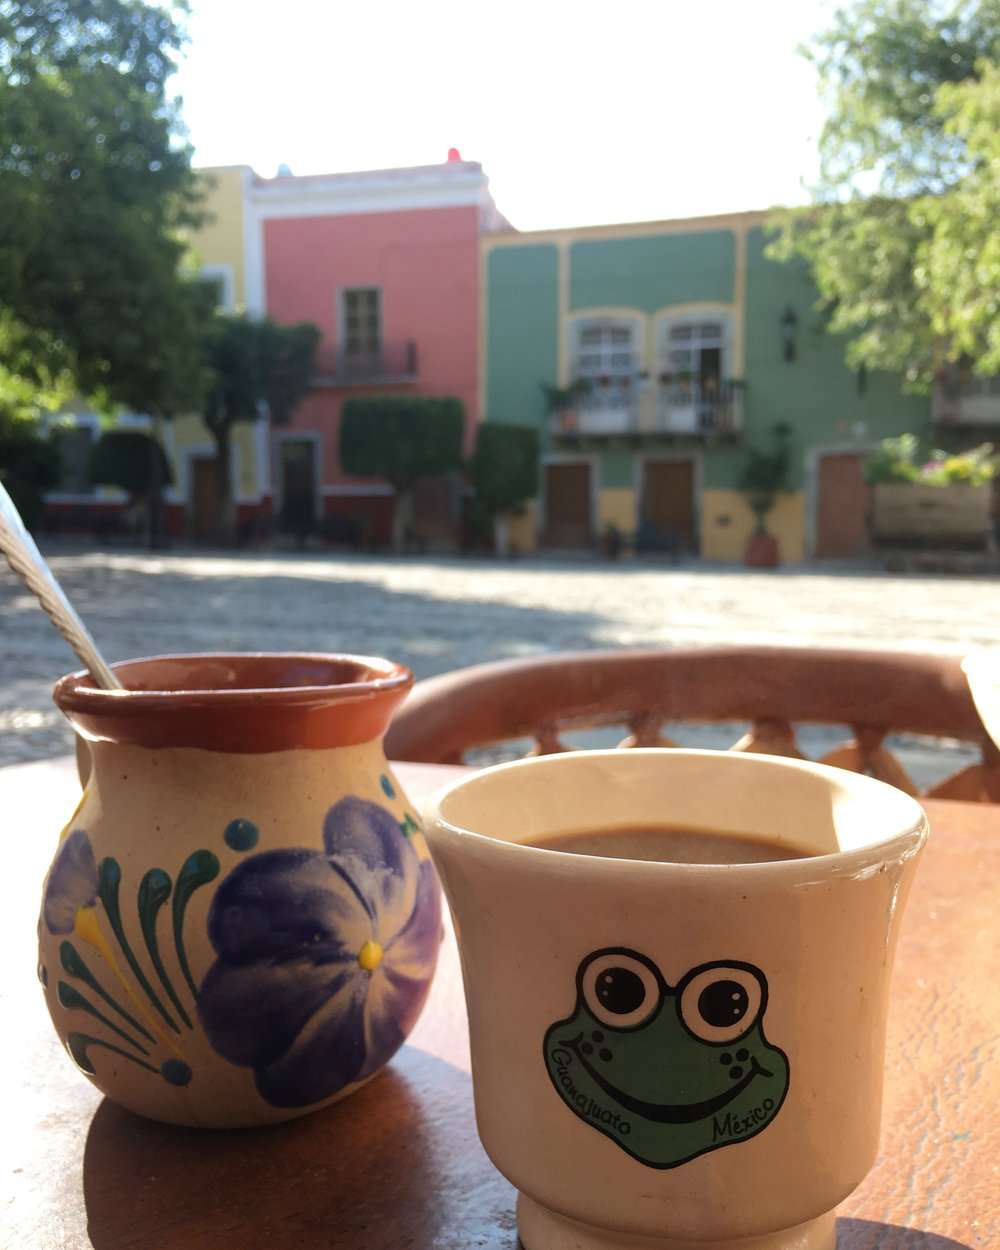 Cafe de Olla in Guanajuato.